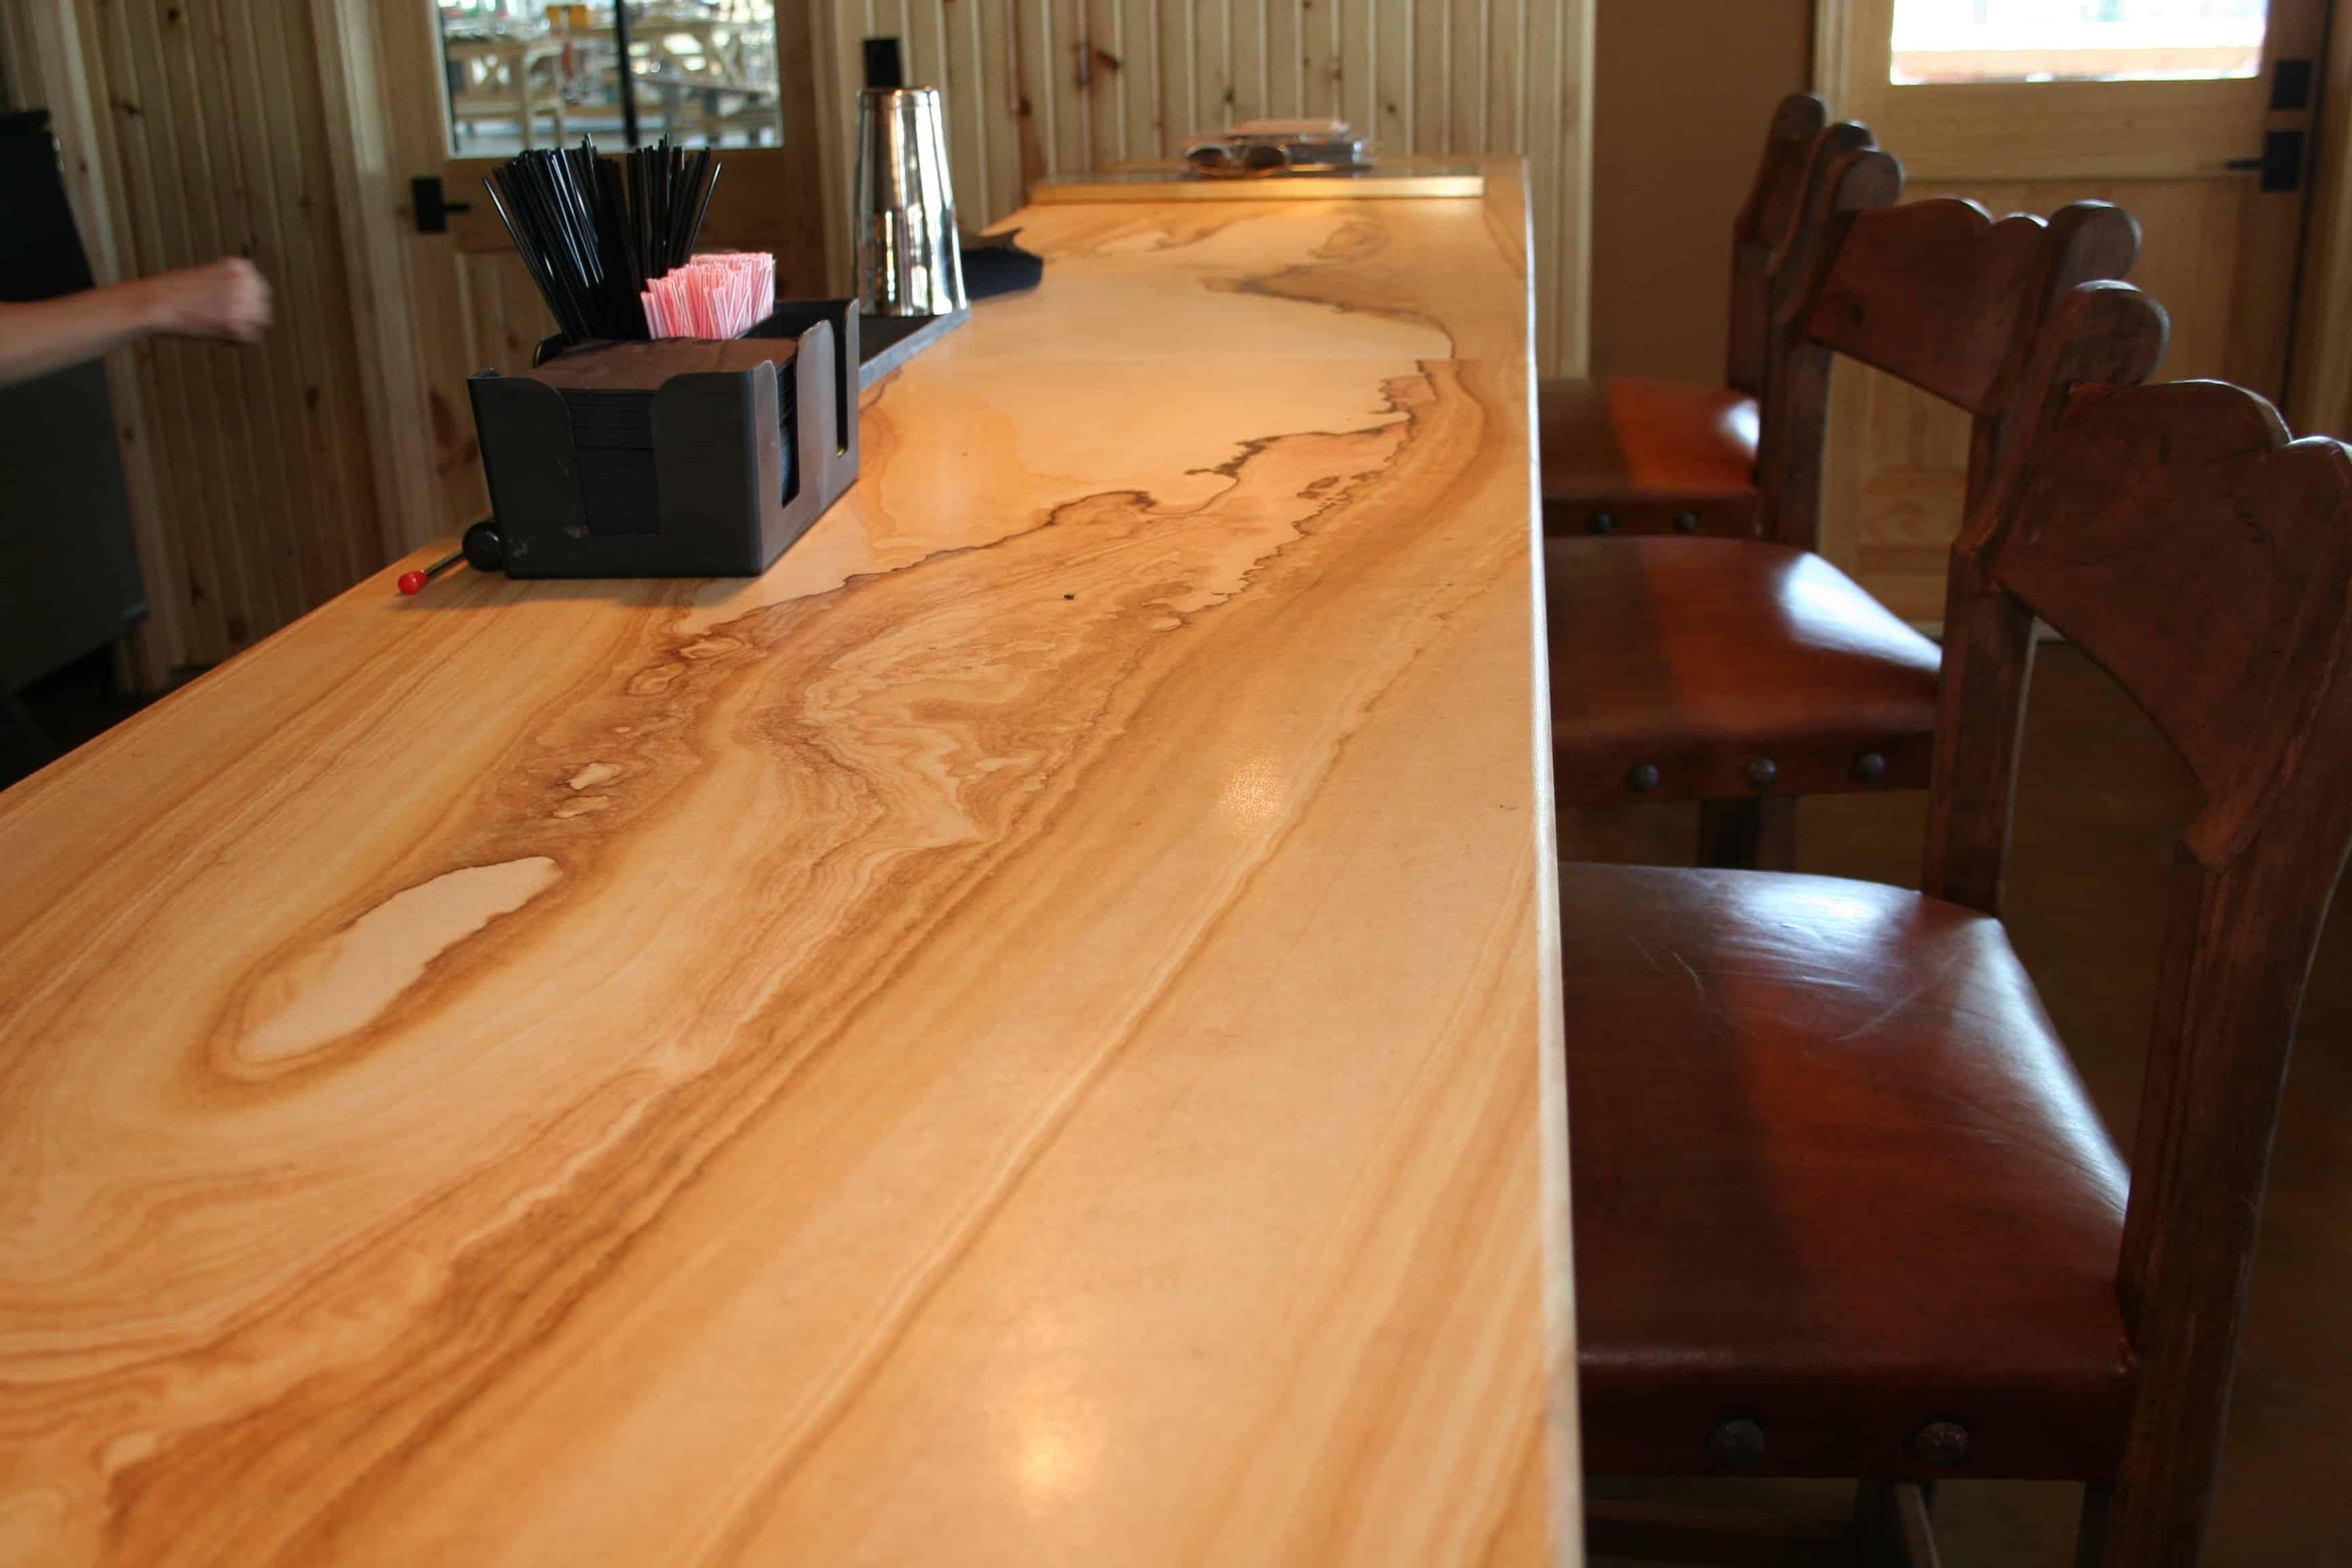 granite countertops cost granite kitchen countertops cost marble countertops are sandstone countertops a good choice for